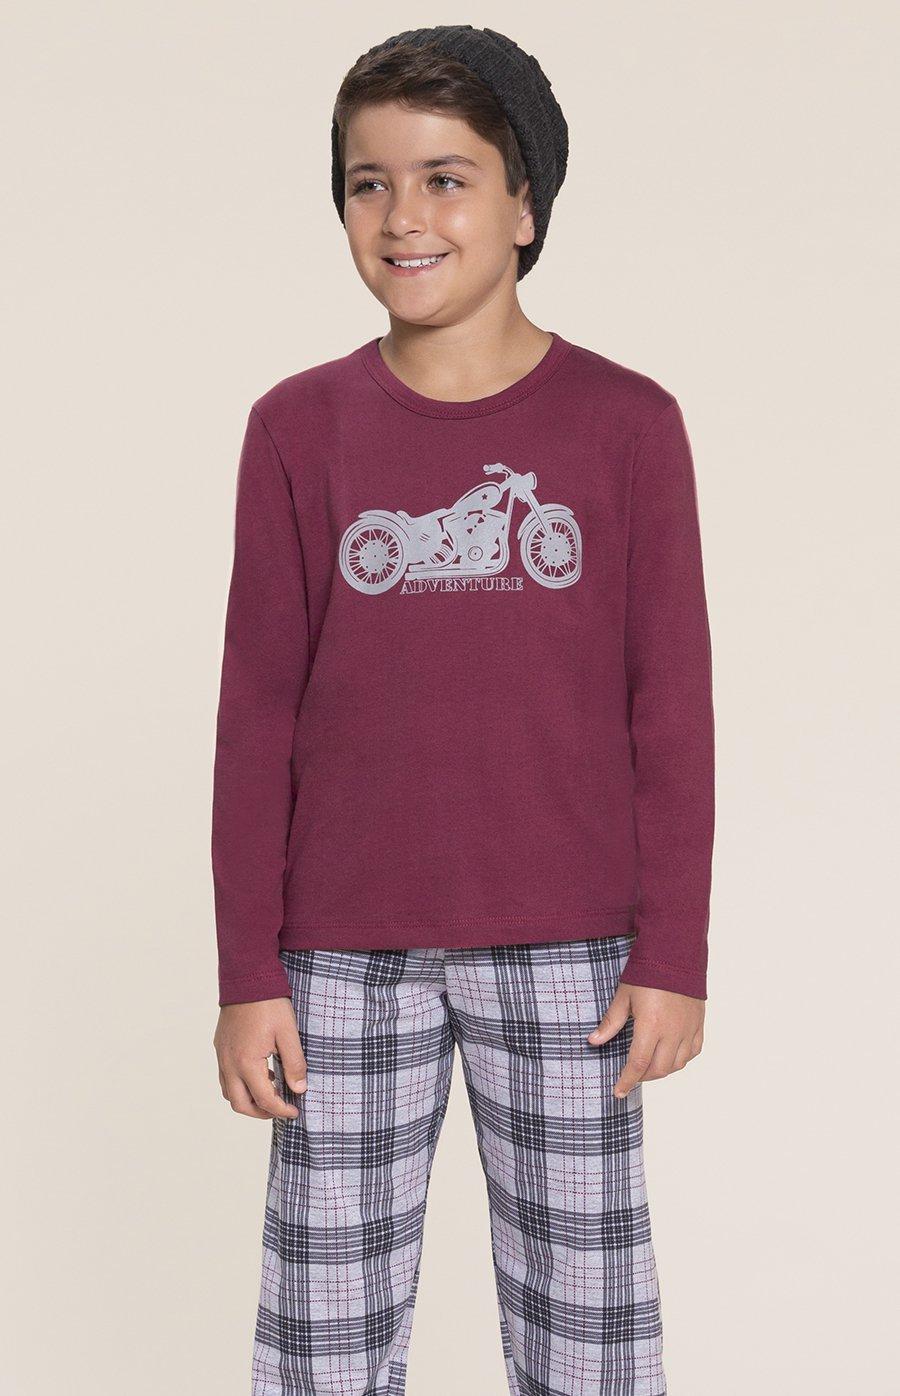 Pijama Teen 1/2 Malha Aventura Inverno 2020 SWEET STORIES